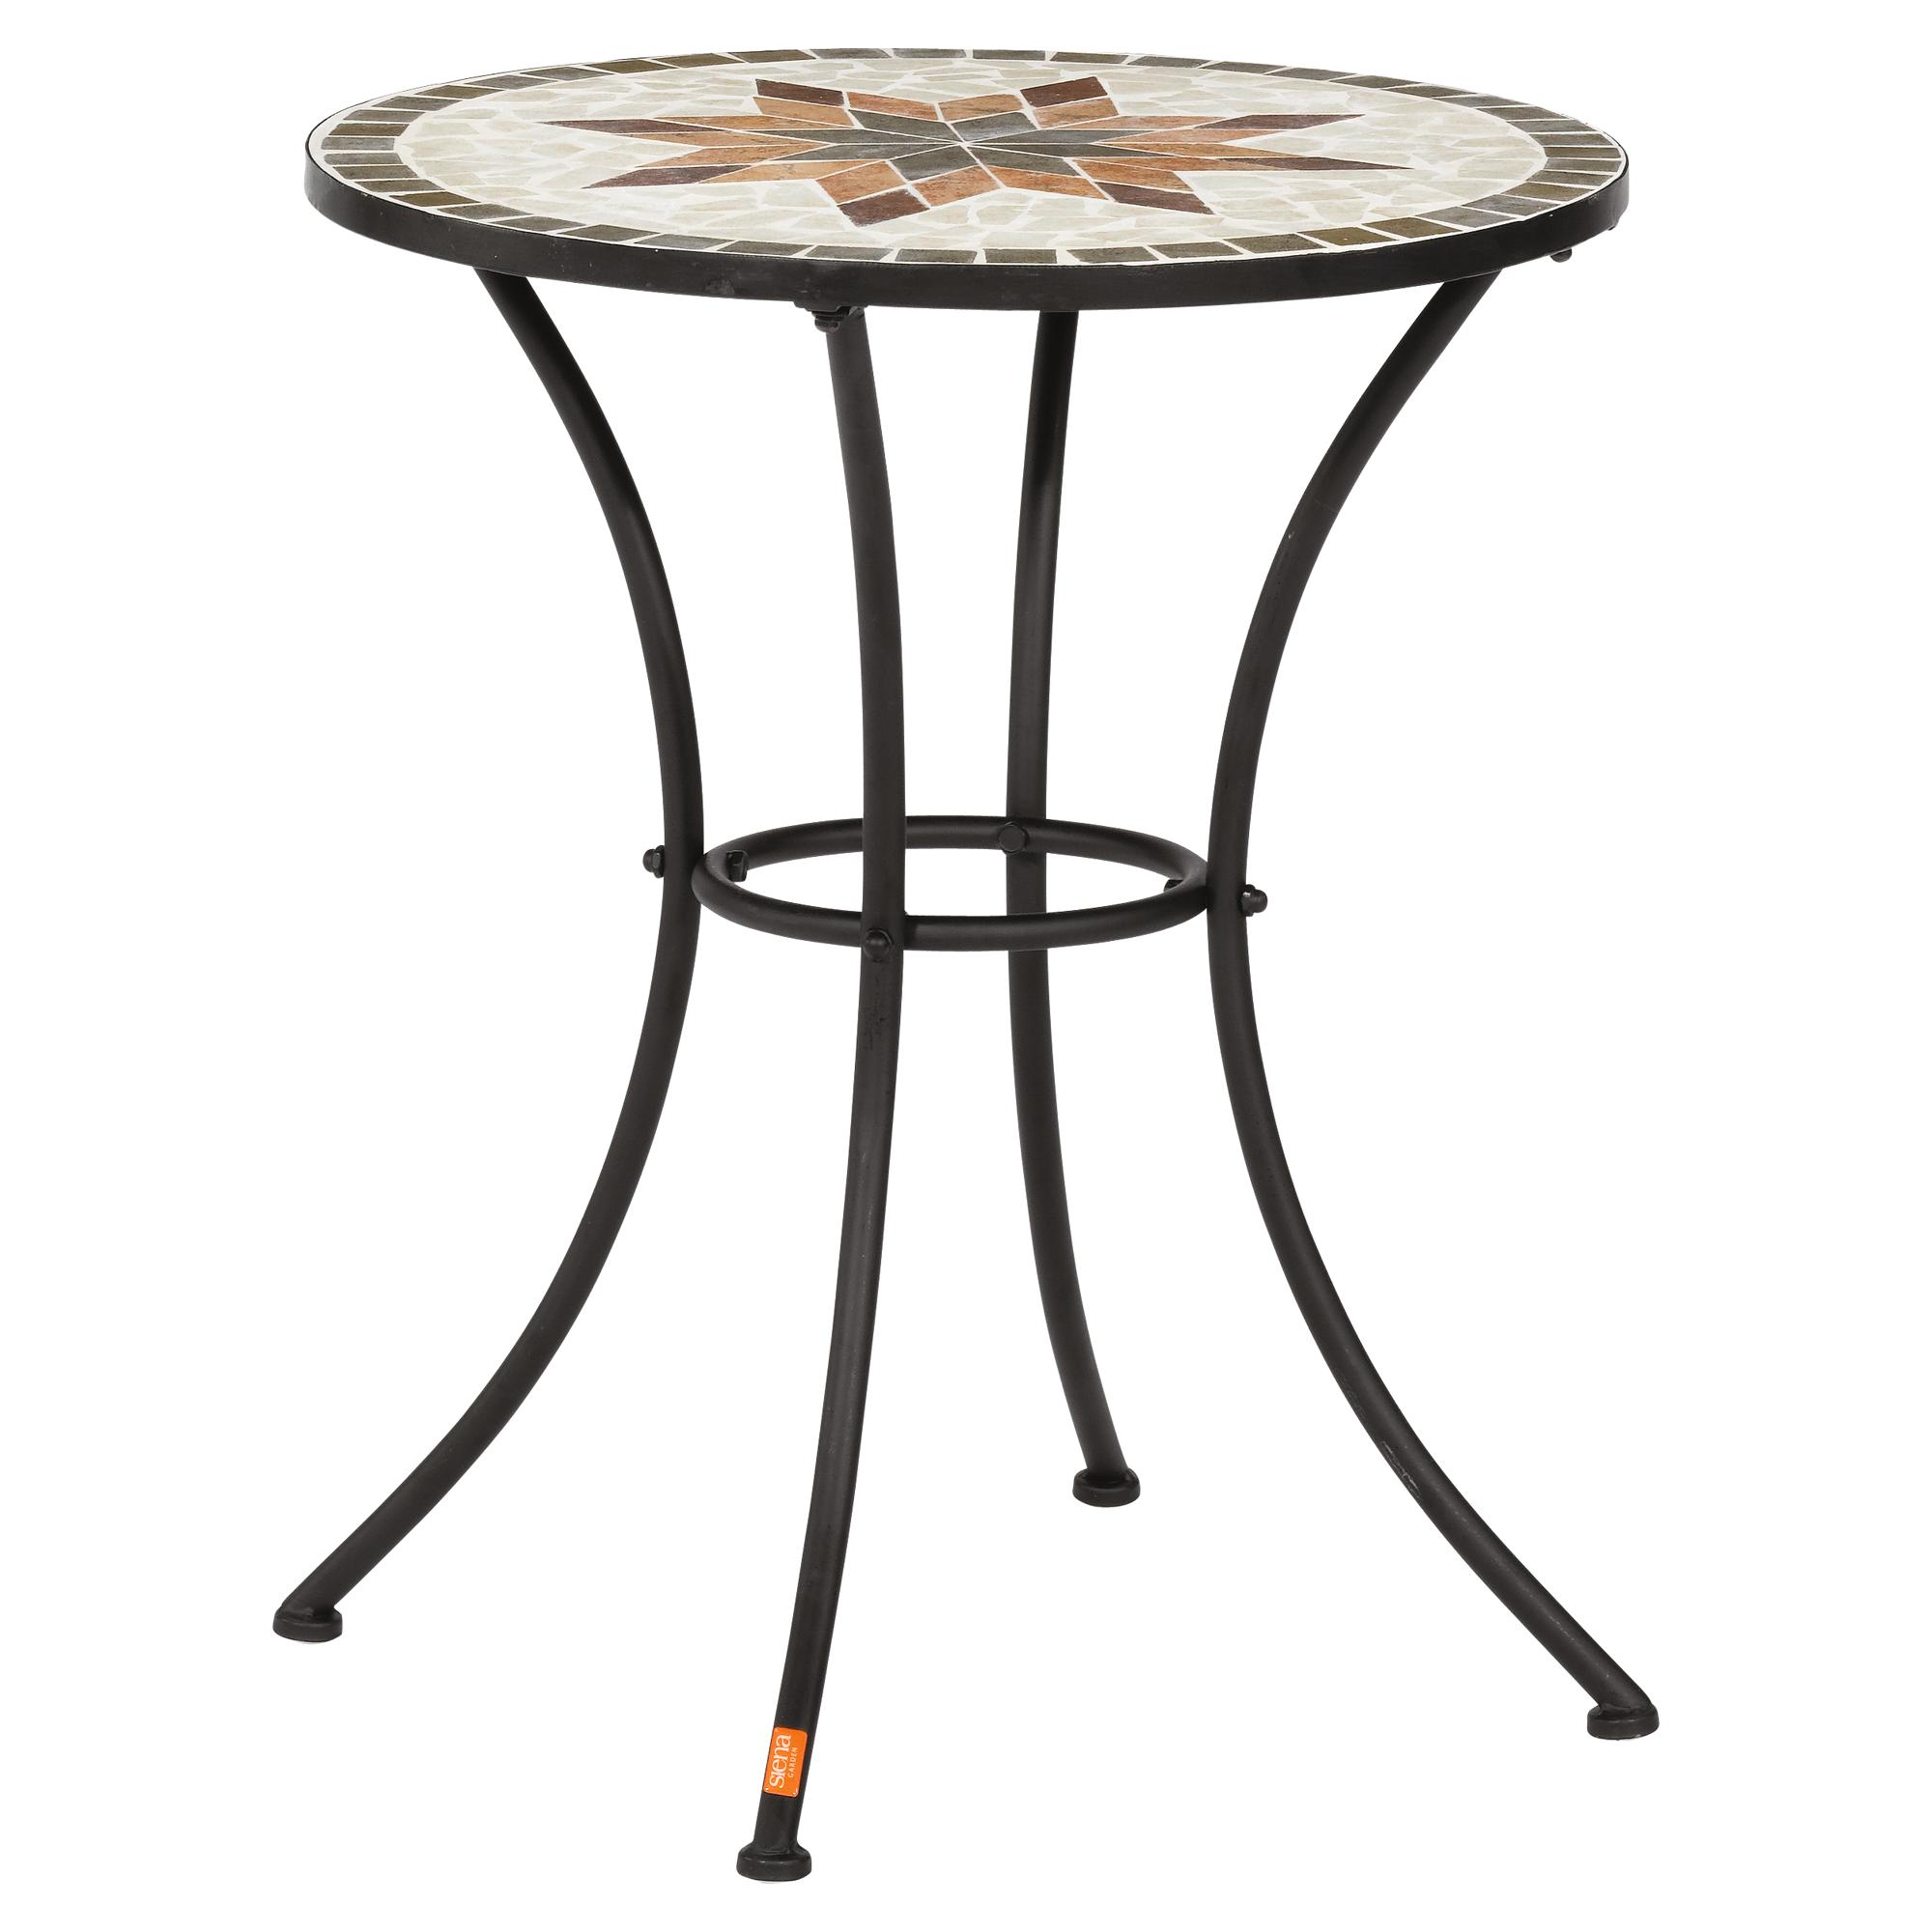 Gartentisch 60 Cm Breit Good Good Jan Kurtz Quadrat Tisch Holz Wei